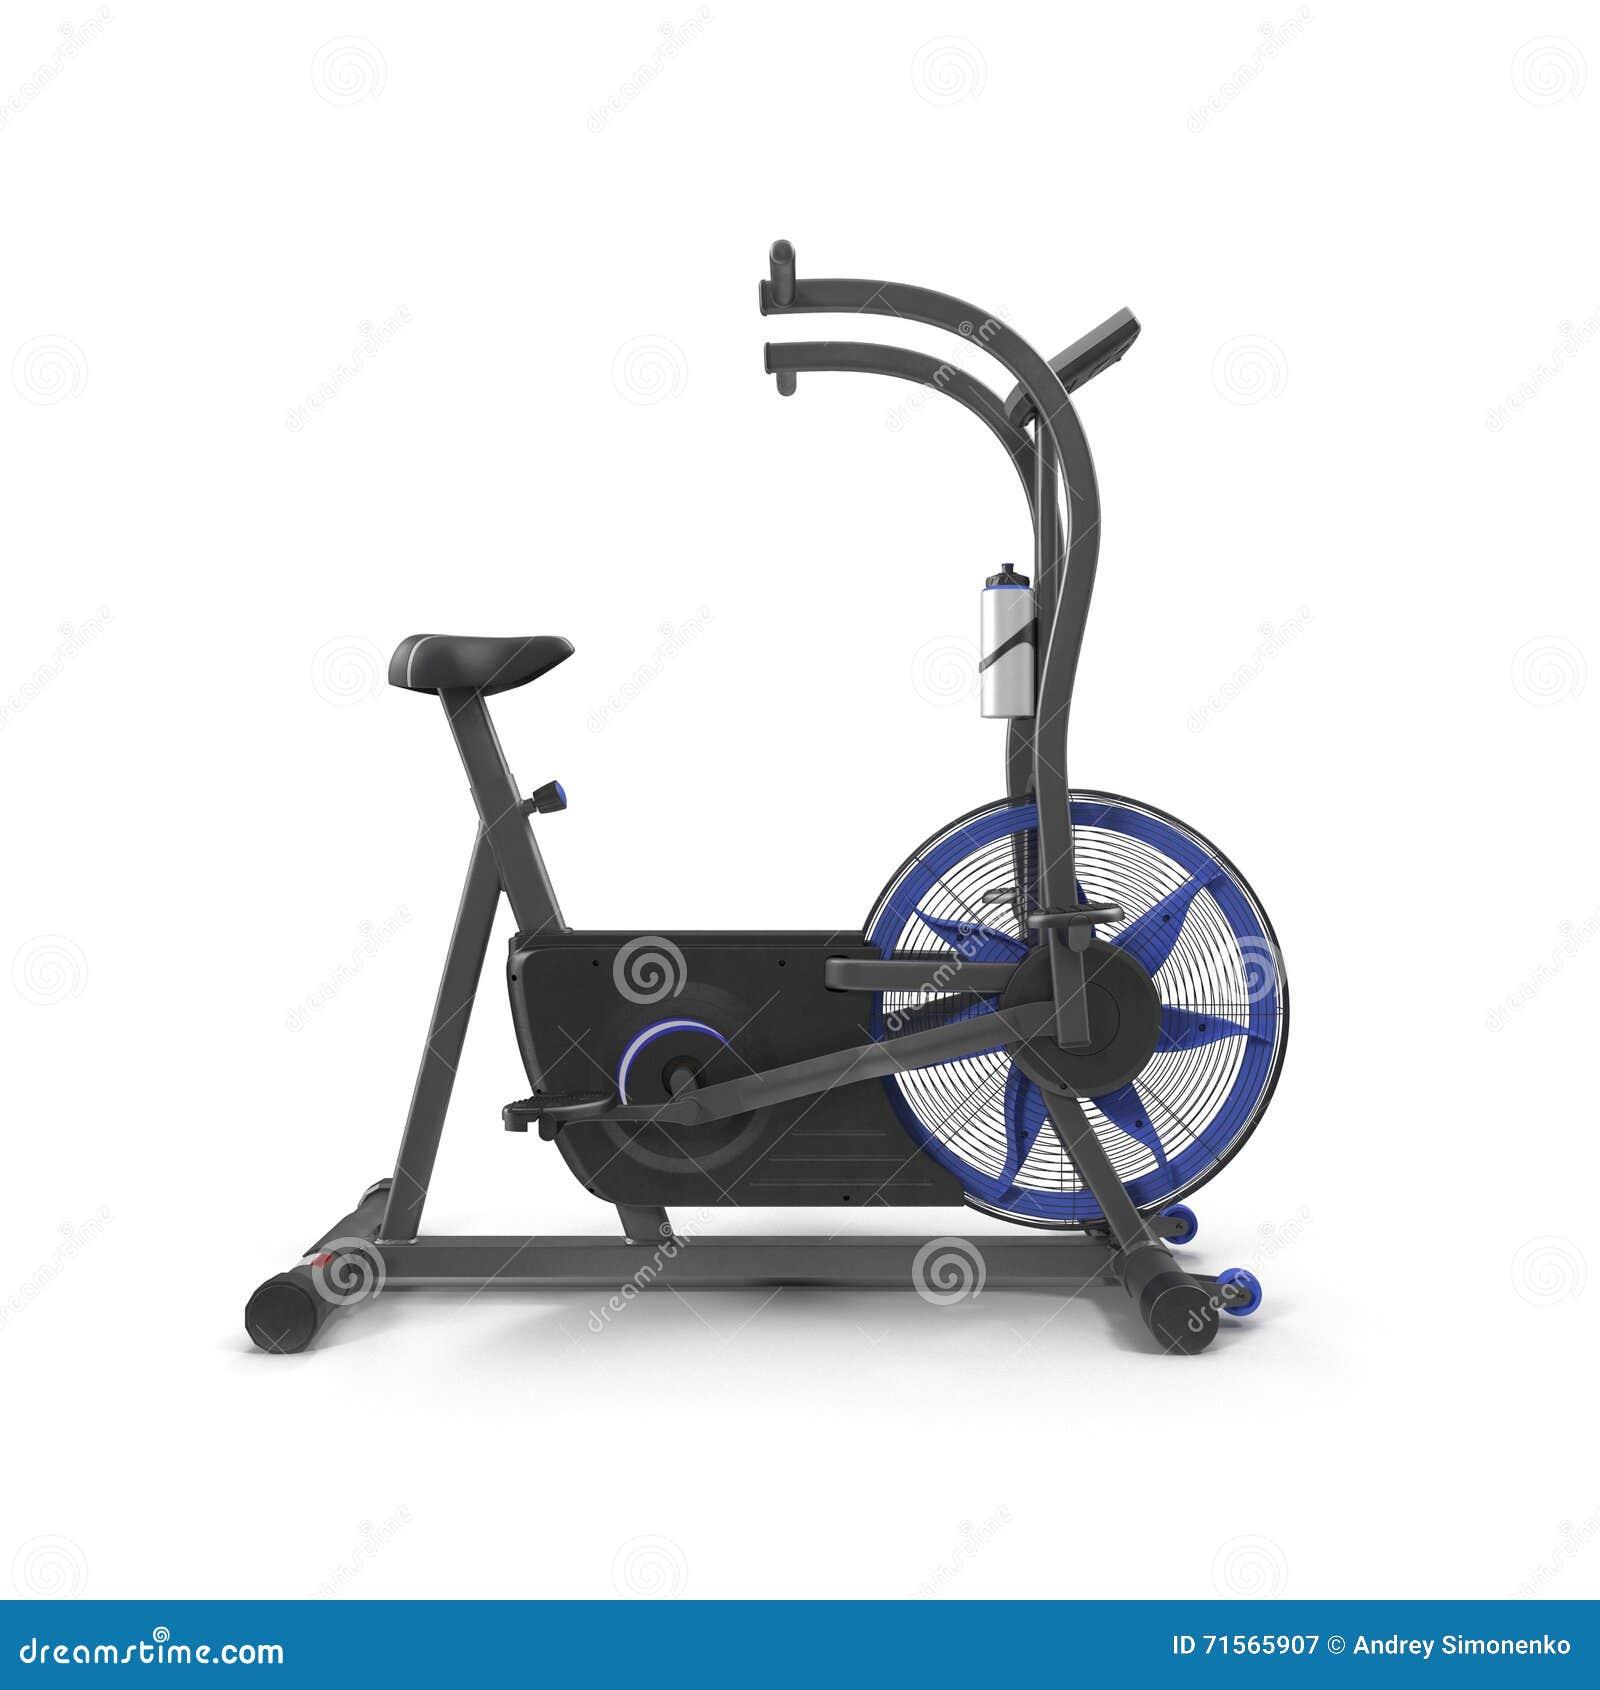 bicycle exercise machine